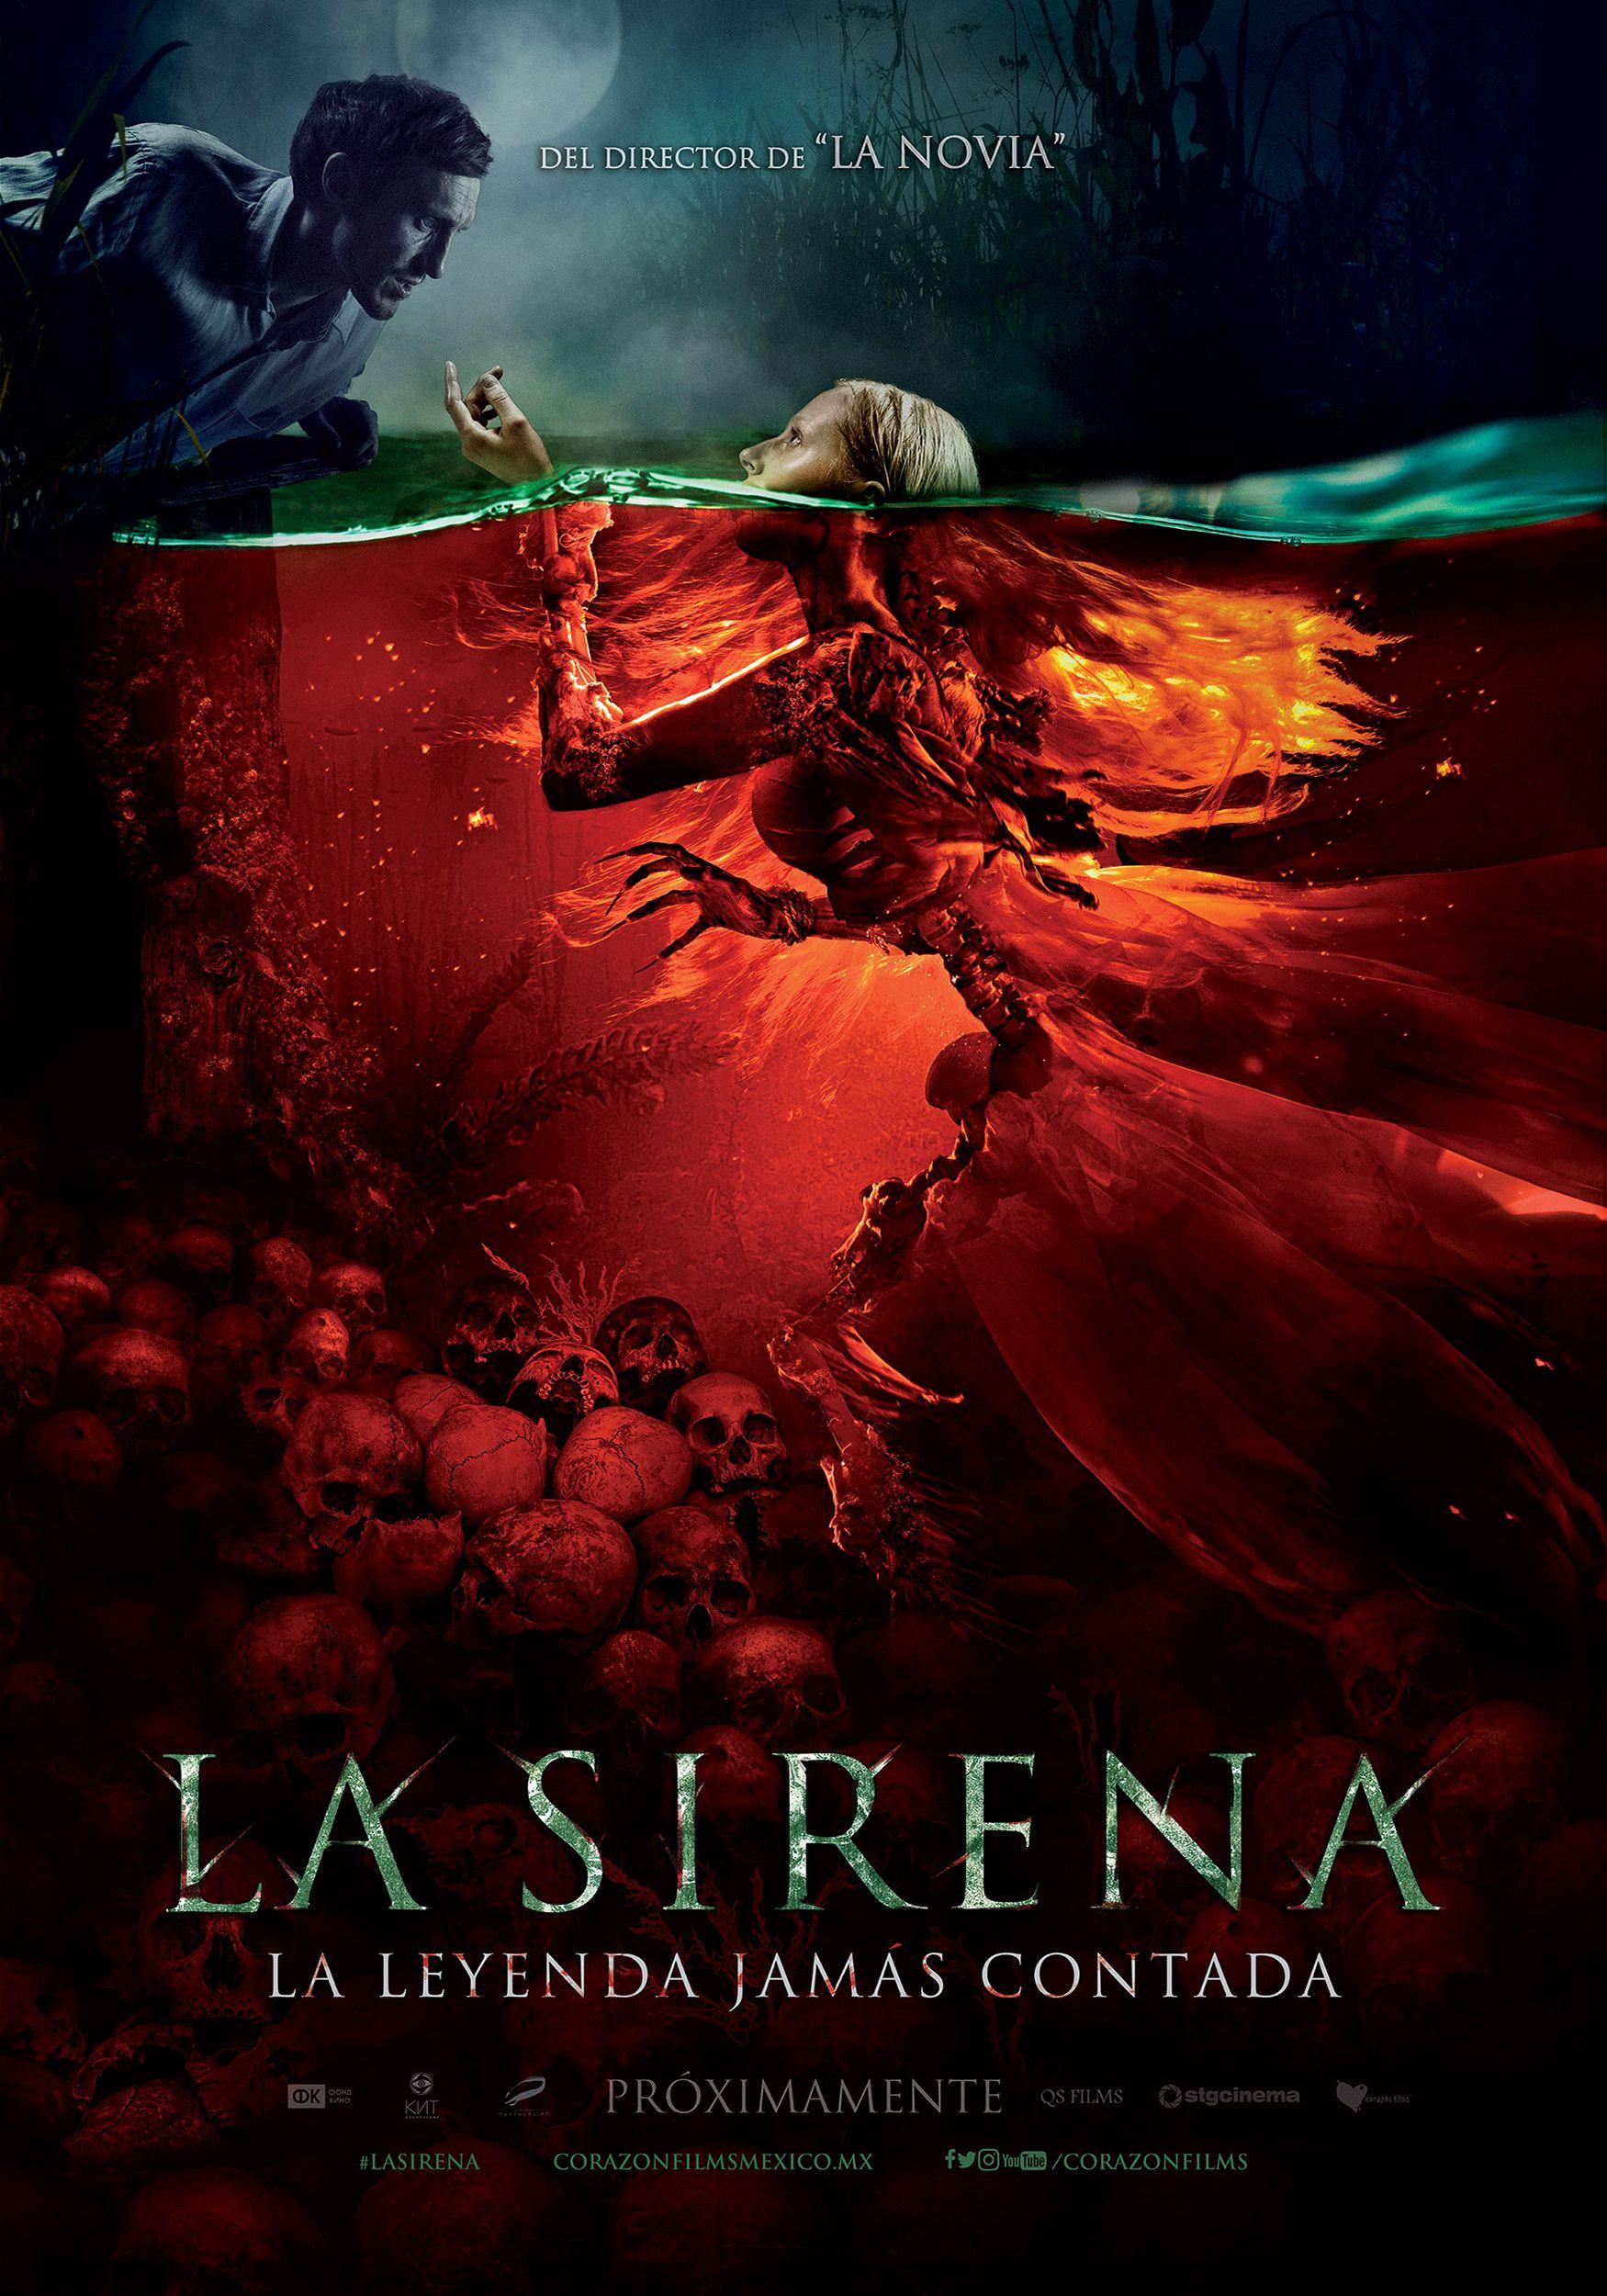 Pin De Celine Bosmans En Netflix Sirenas Leyendas La Sirenita Pelicula